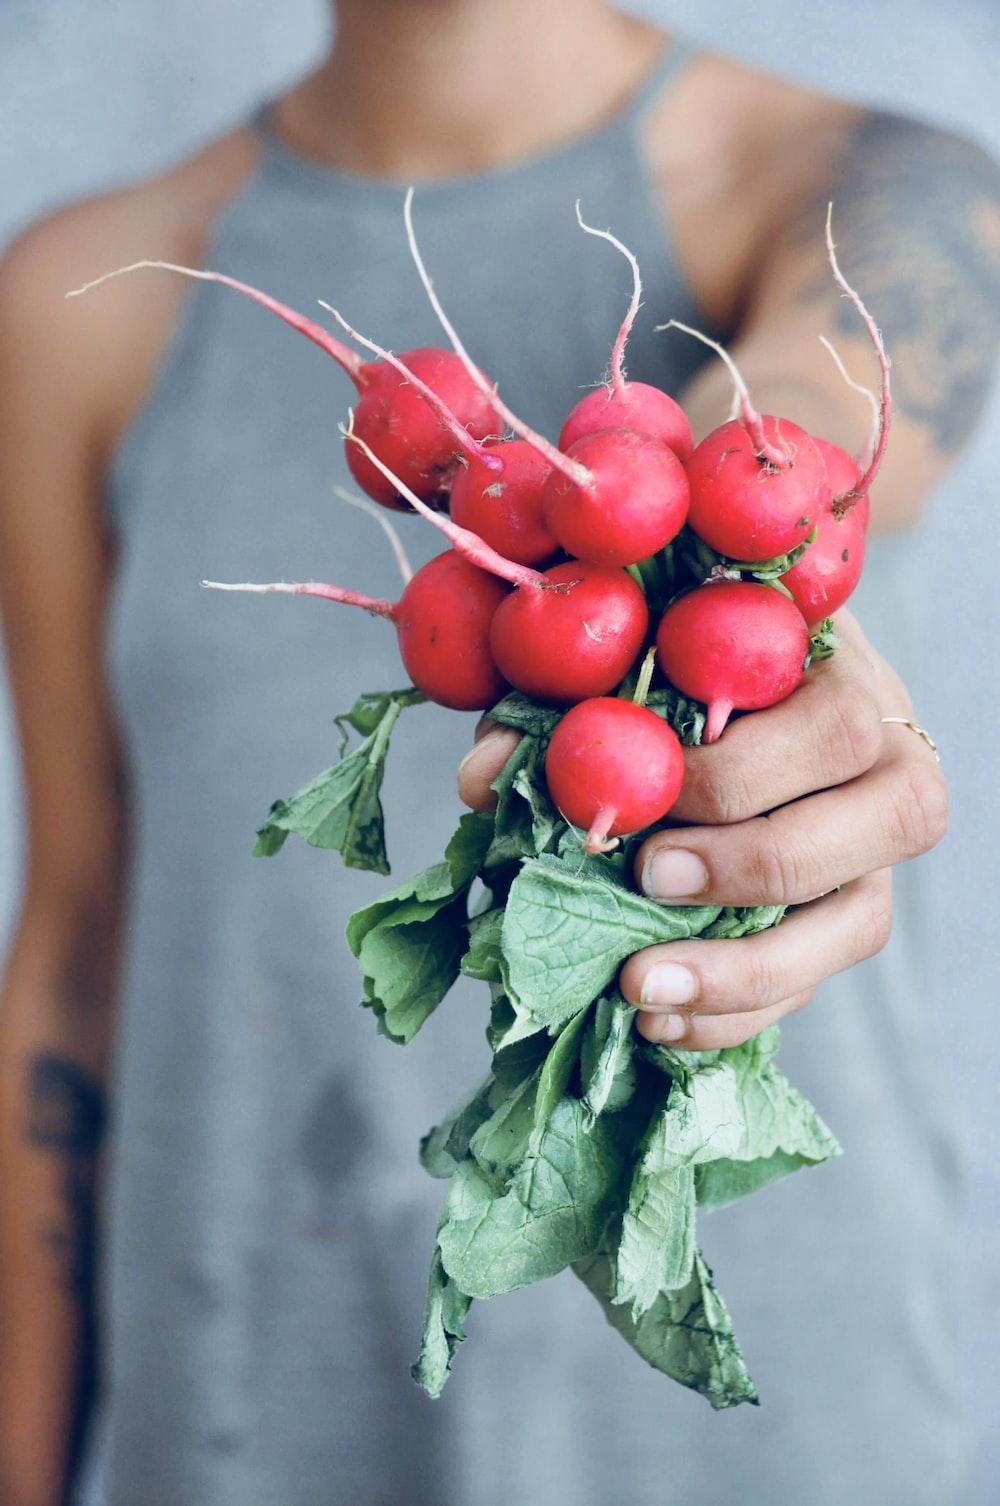 woman holding horseradish